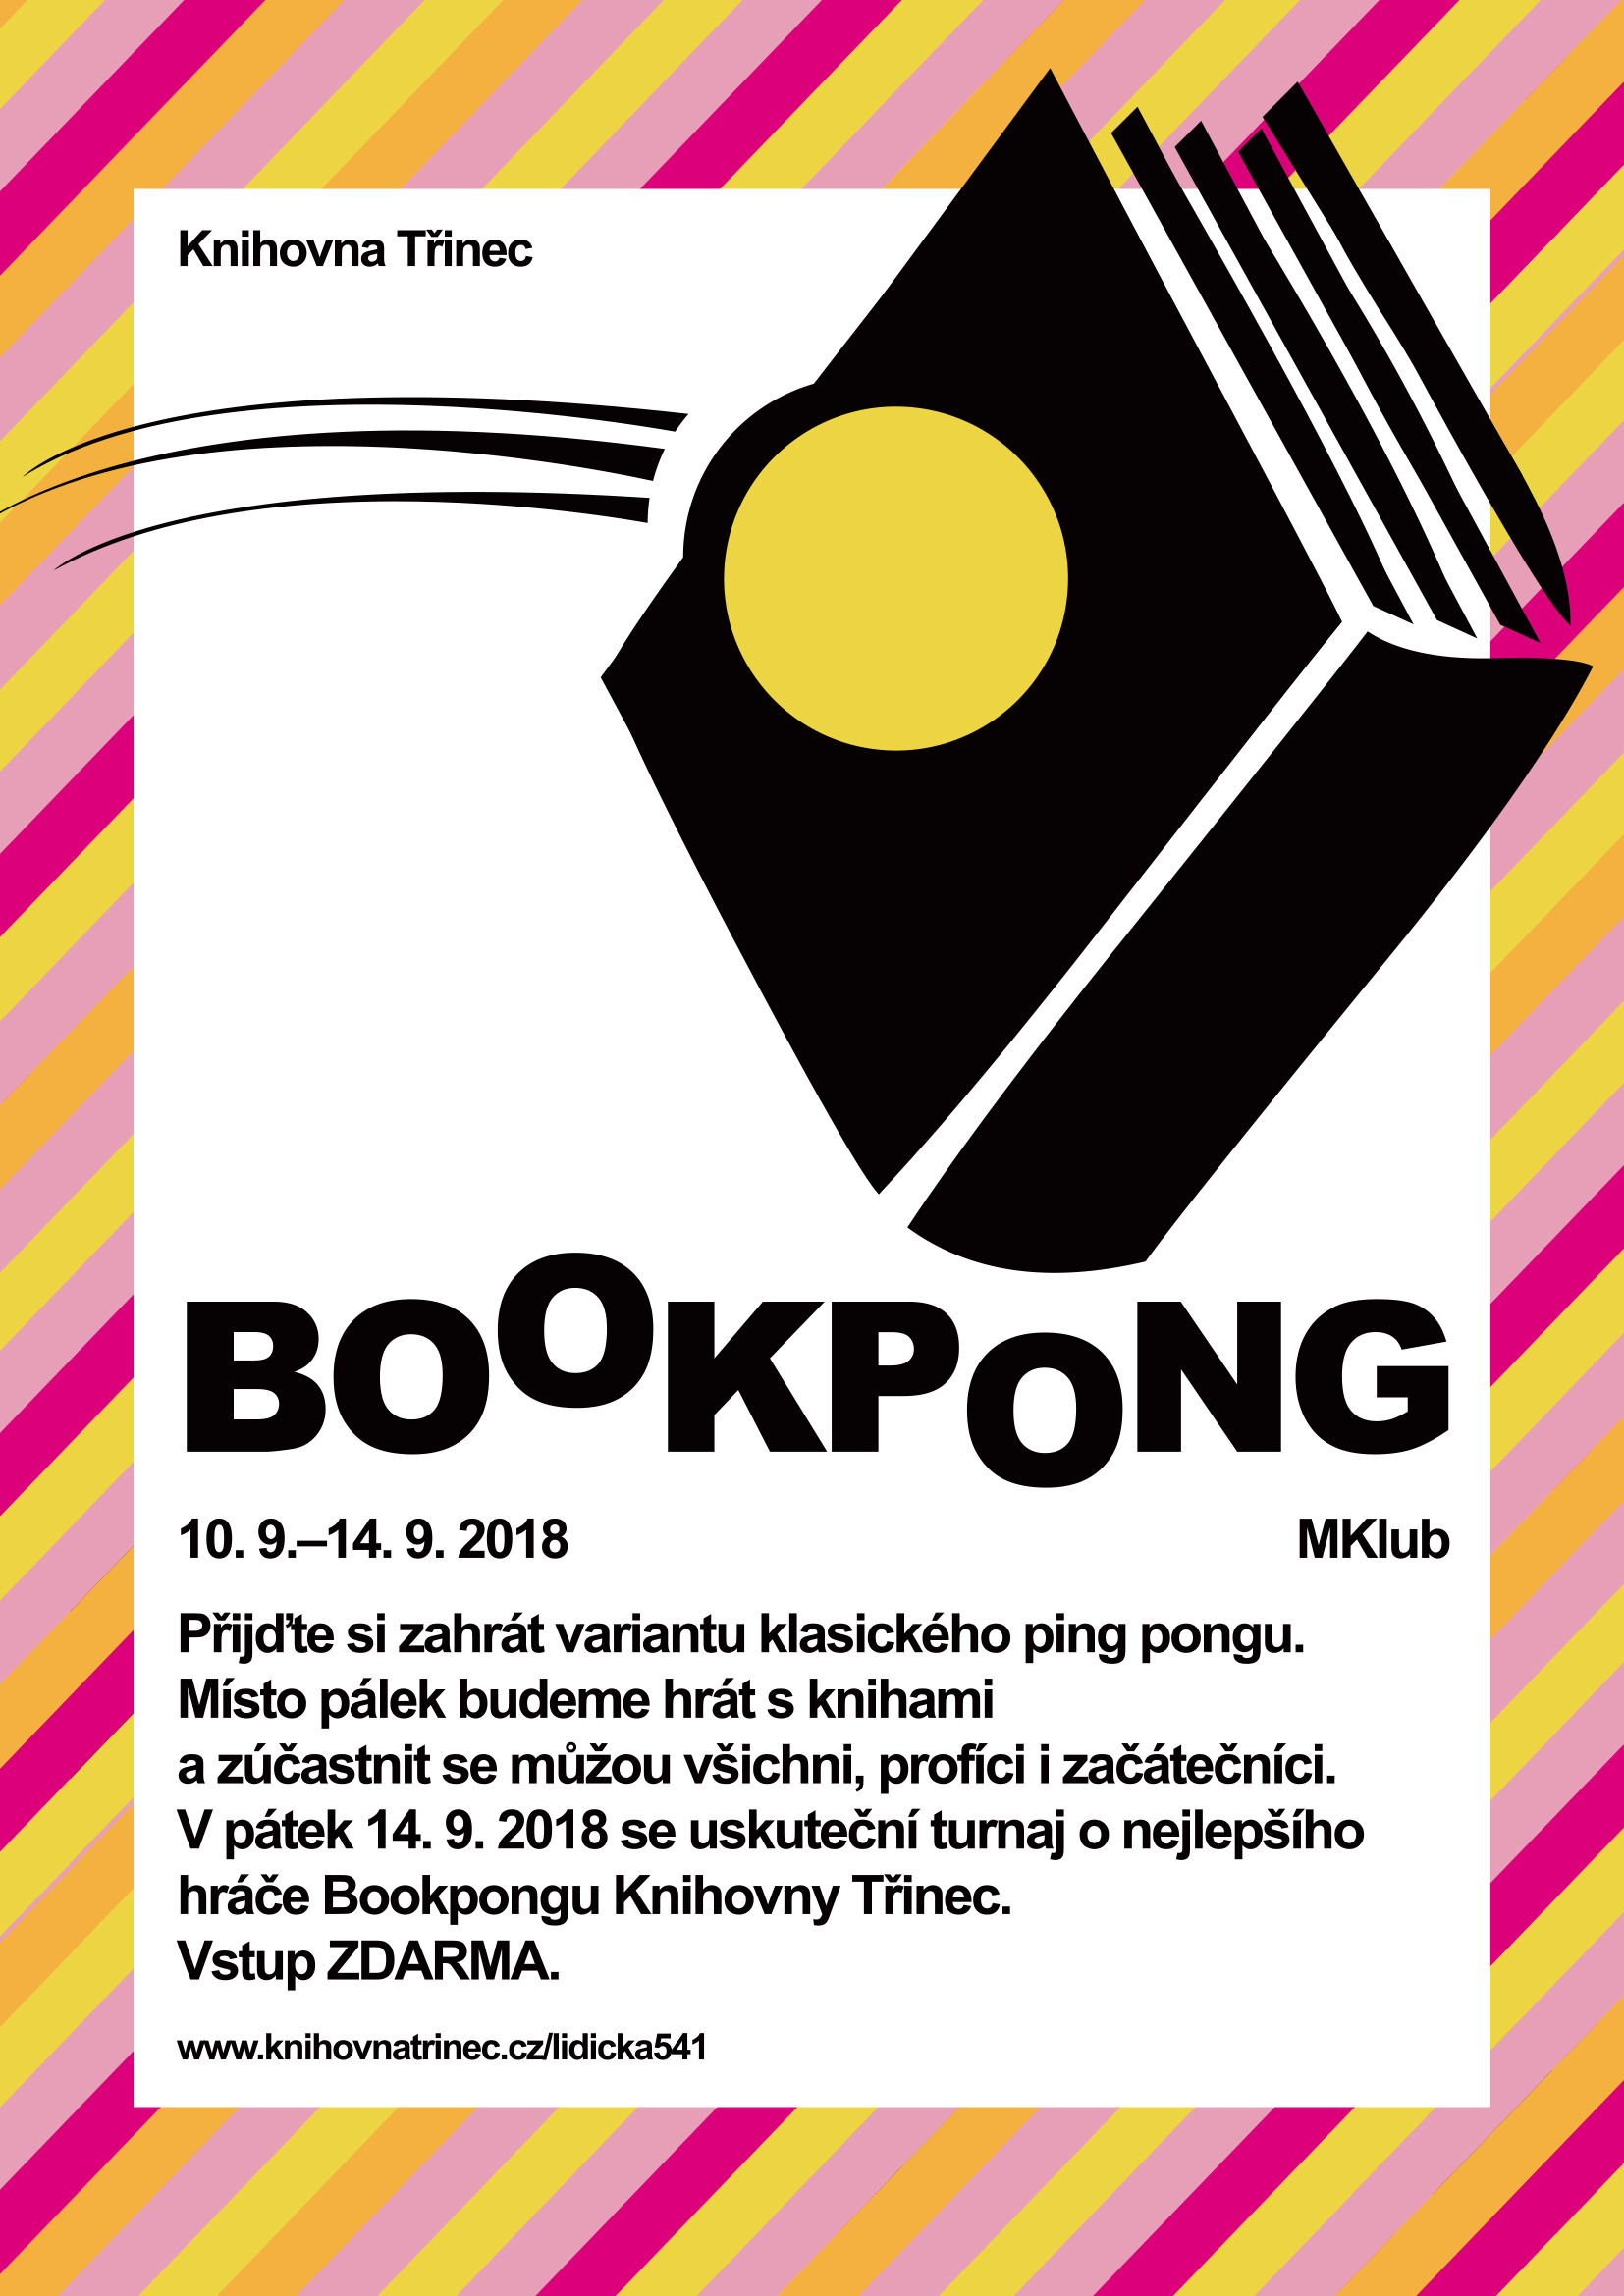 Bookpong turnaj WEB 2